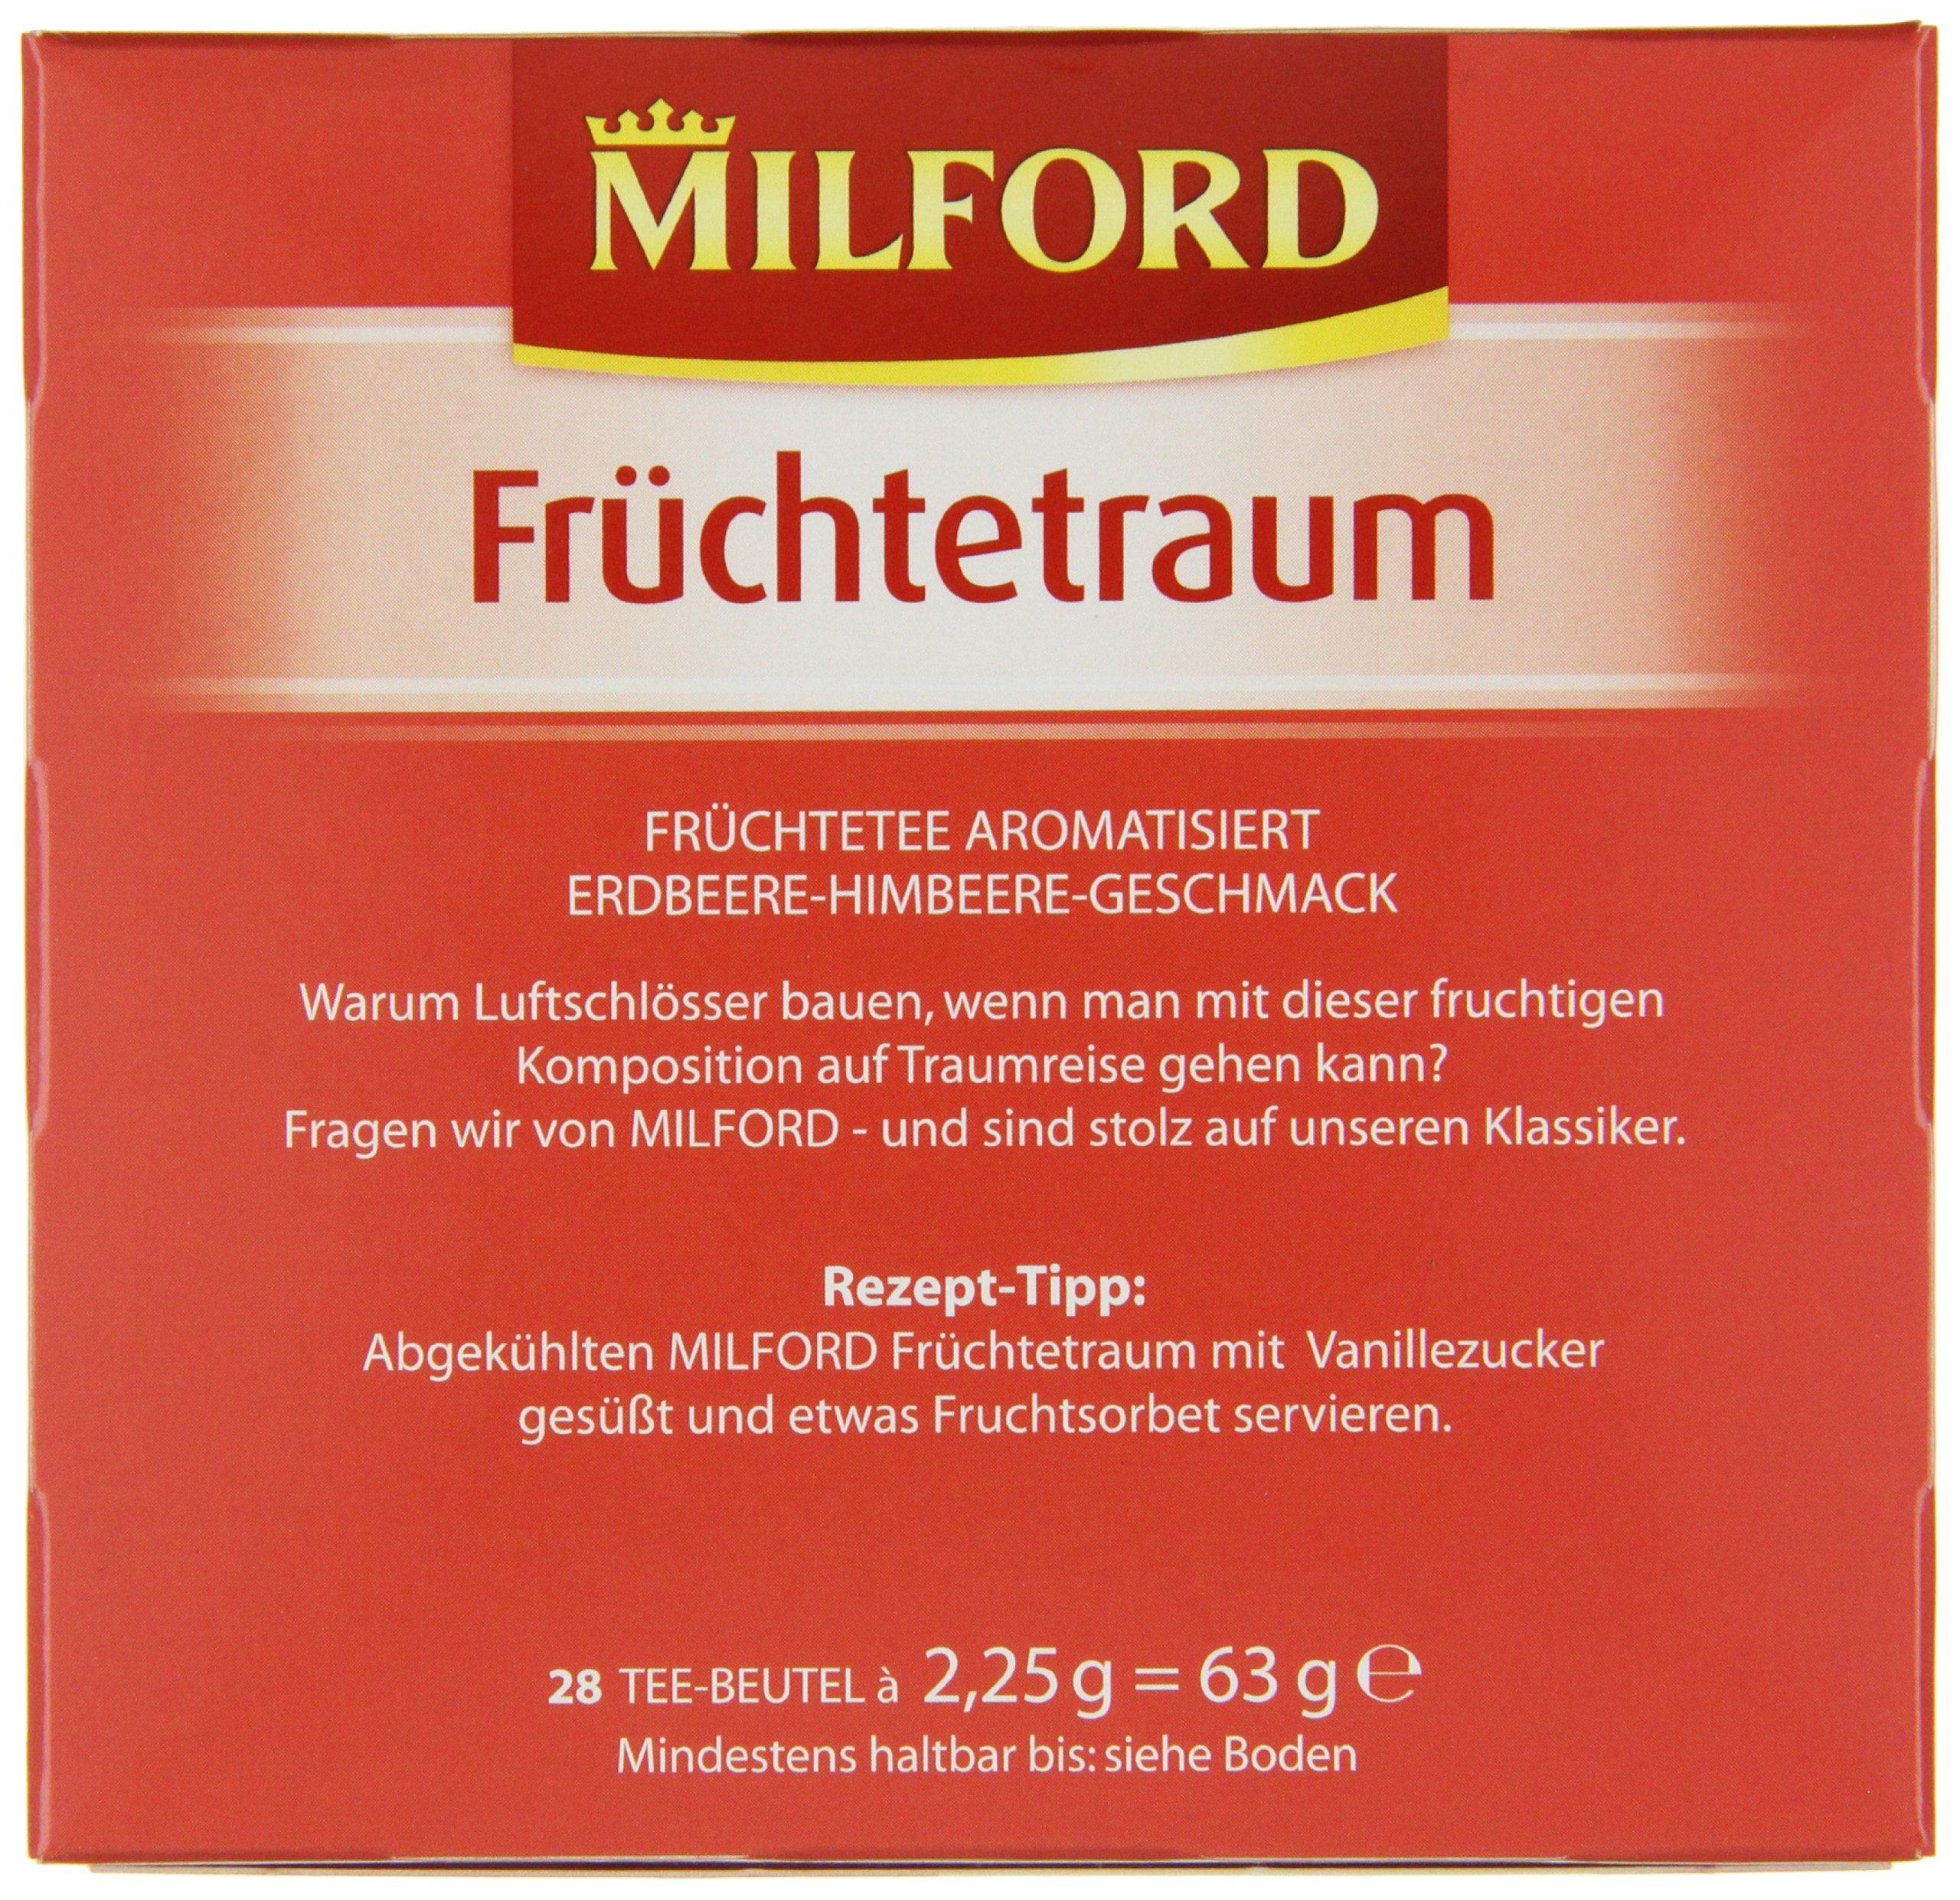 Milford-Frchtetraum-28-x-225-g-6er-Pack-6-x-63-g